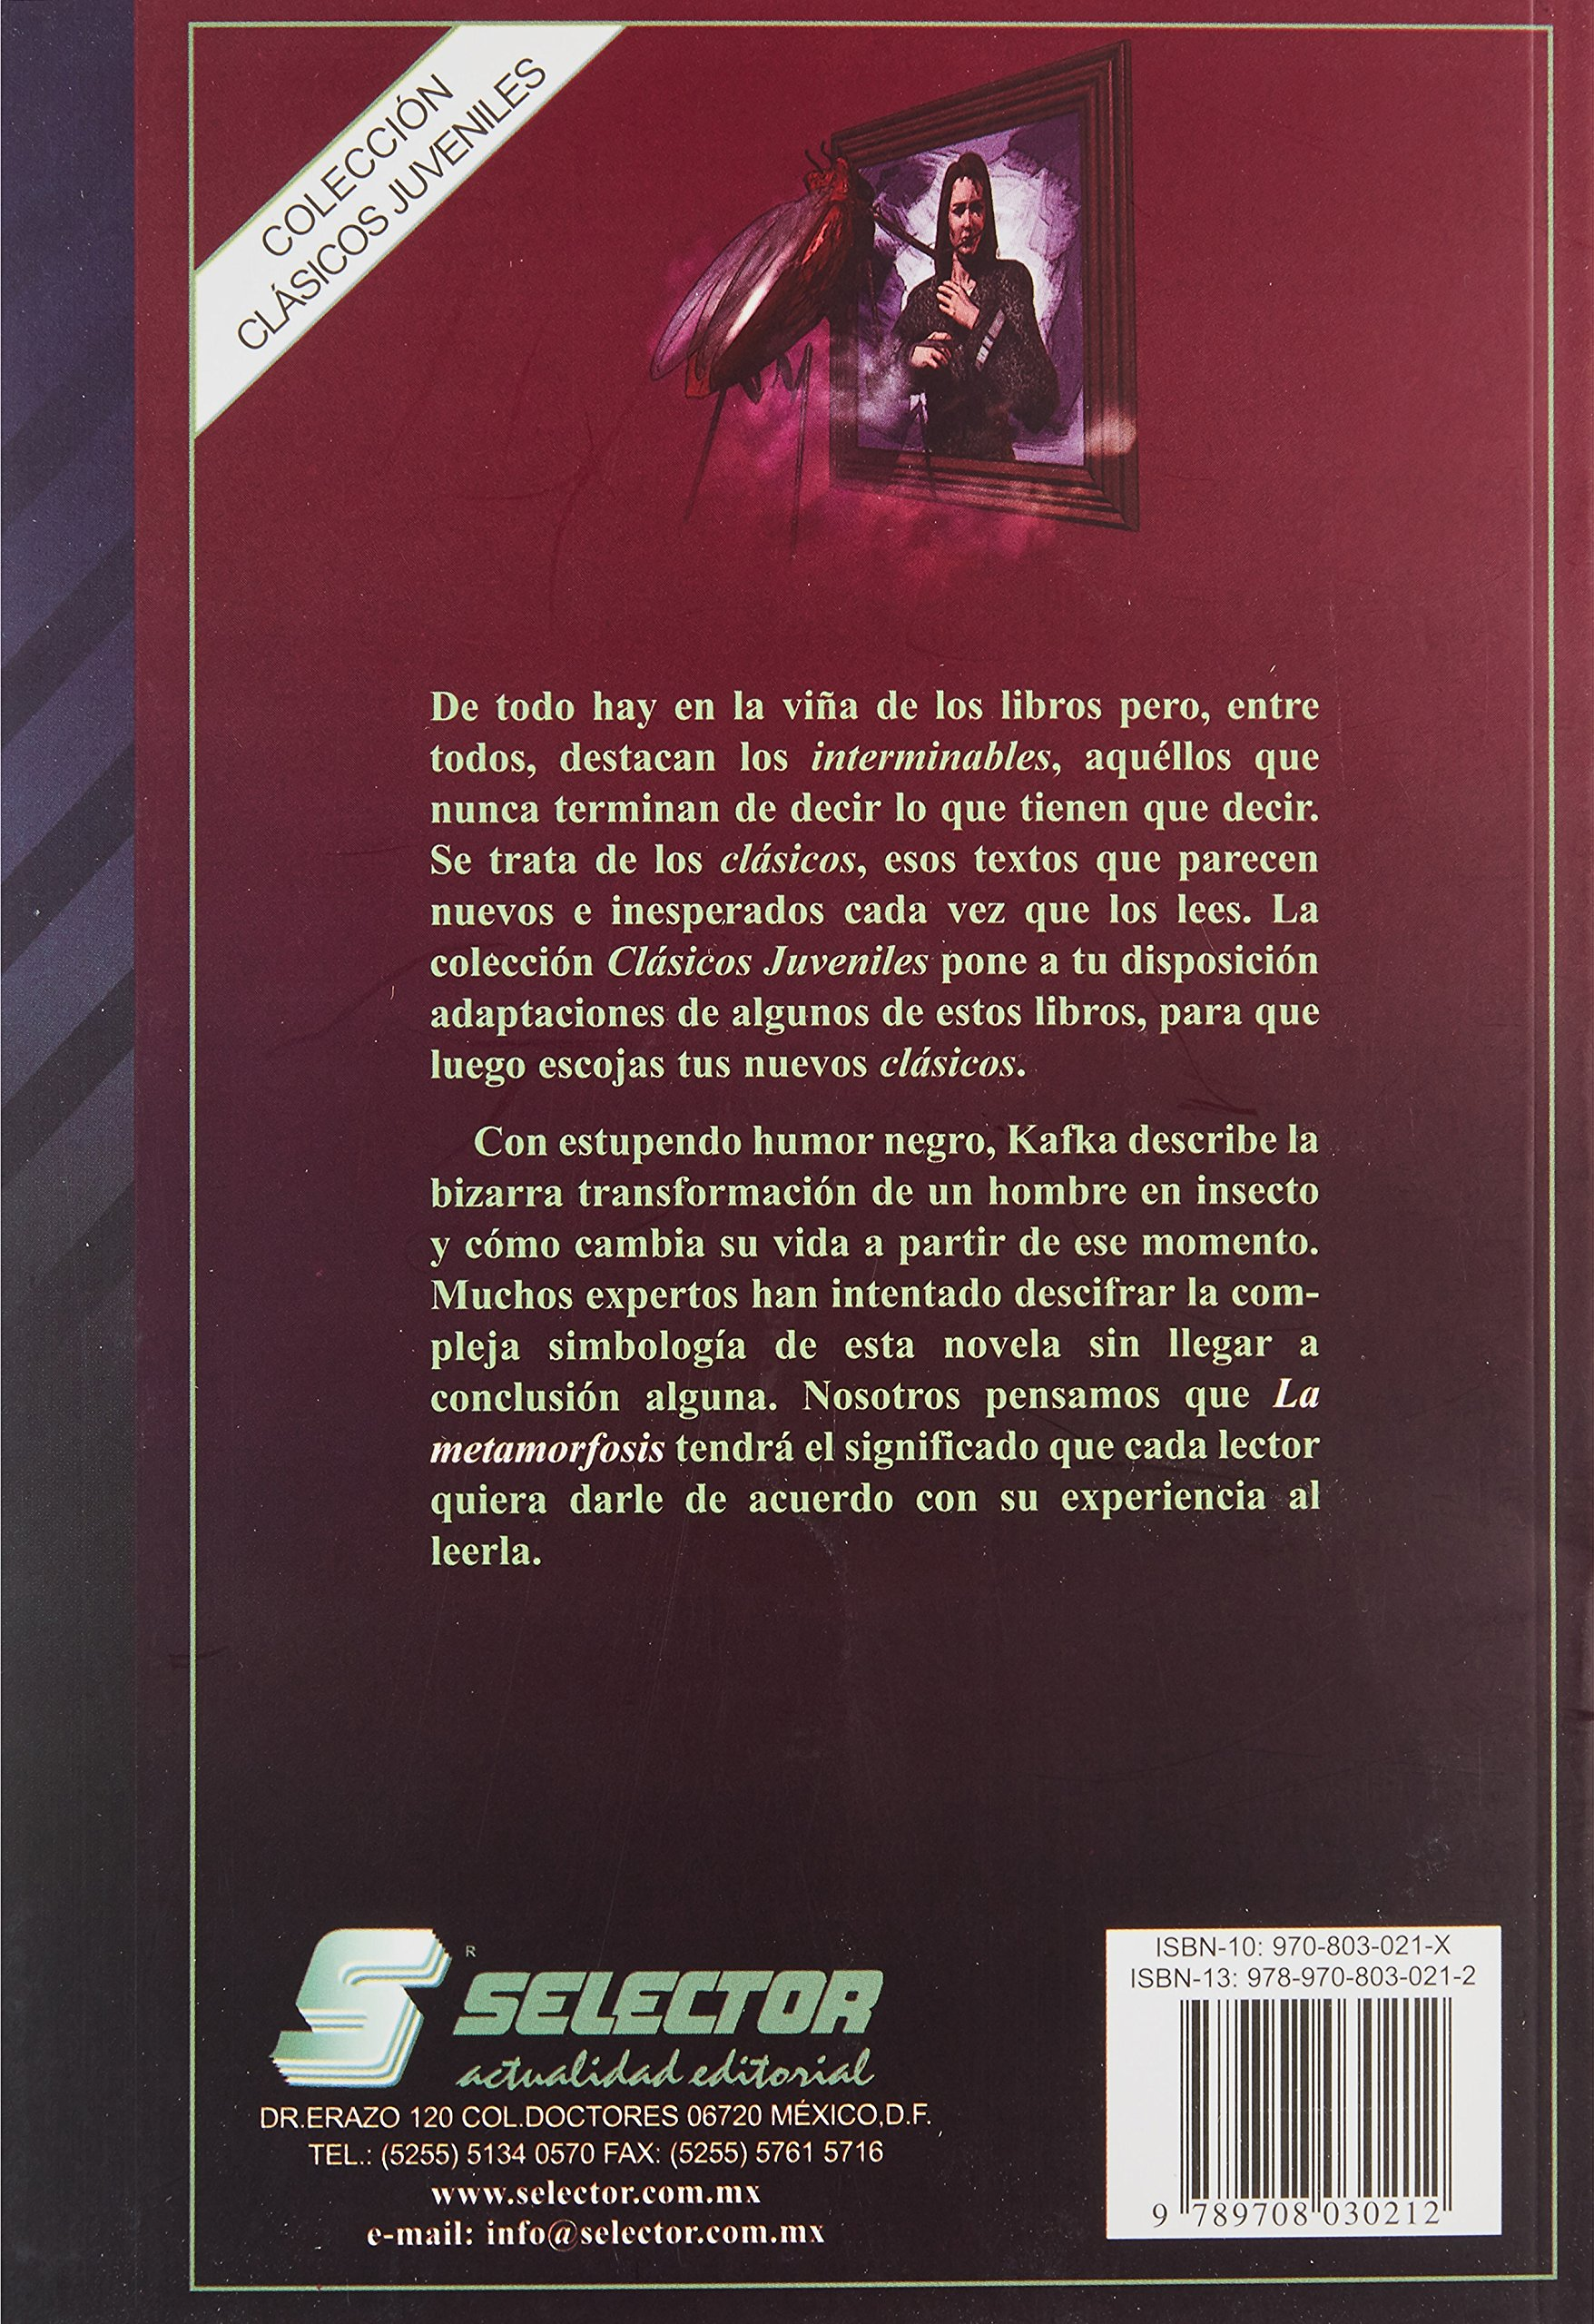 Amazon.com: La metamorfosis (Spanish Edition) (9789708030212 ...